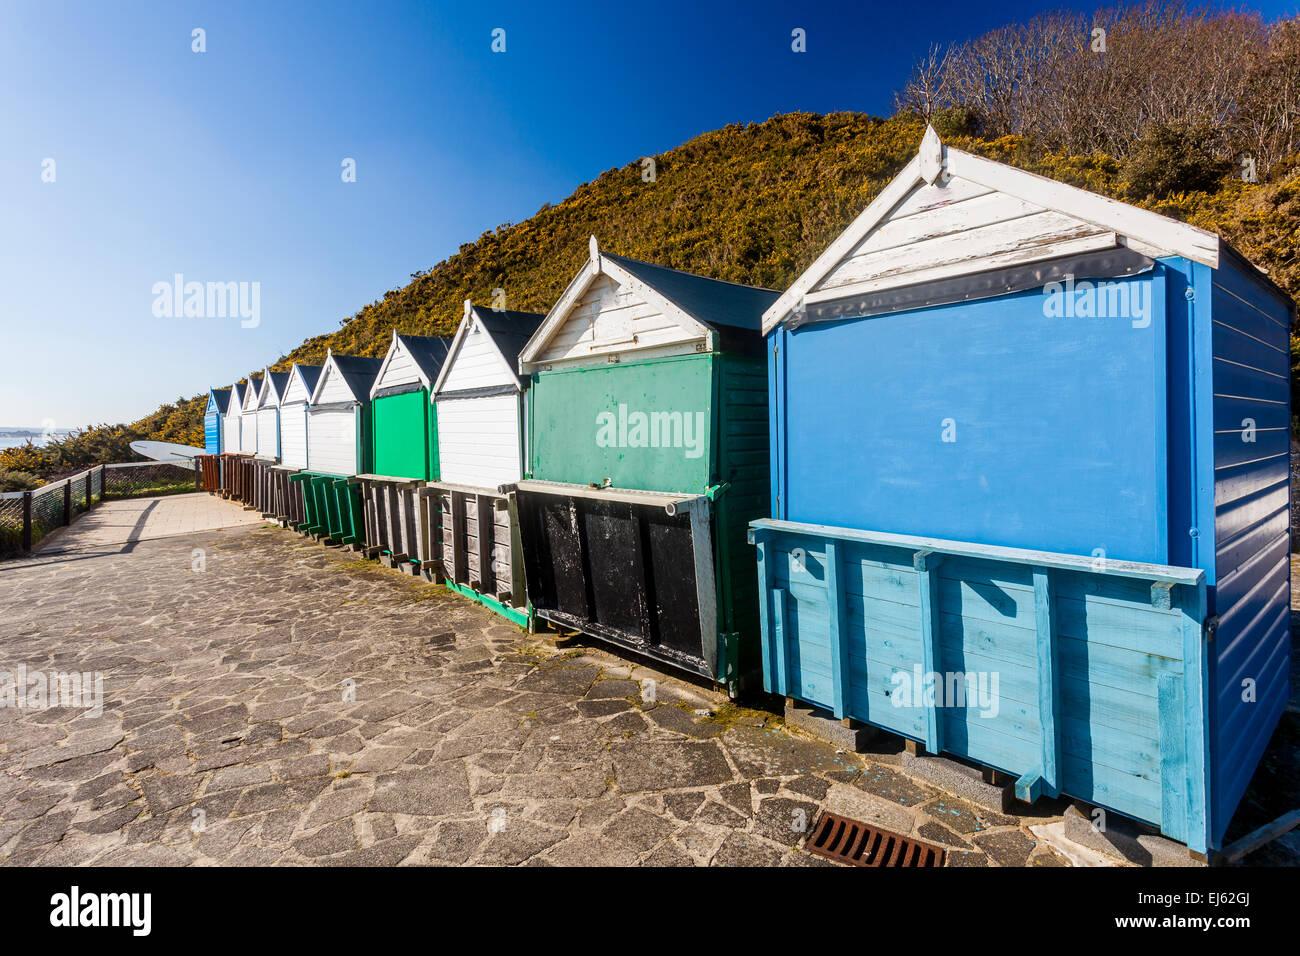 Beach huts at Middle Chine beach Bournemouth Dorset England UK Europe - Stock Image